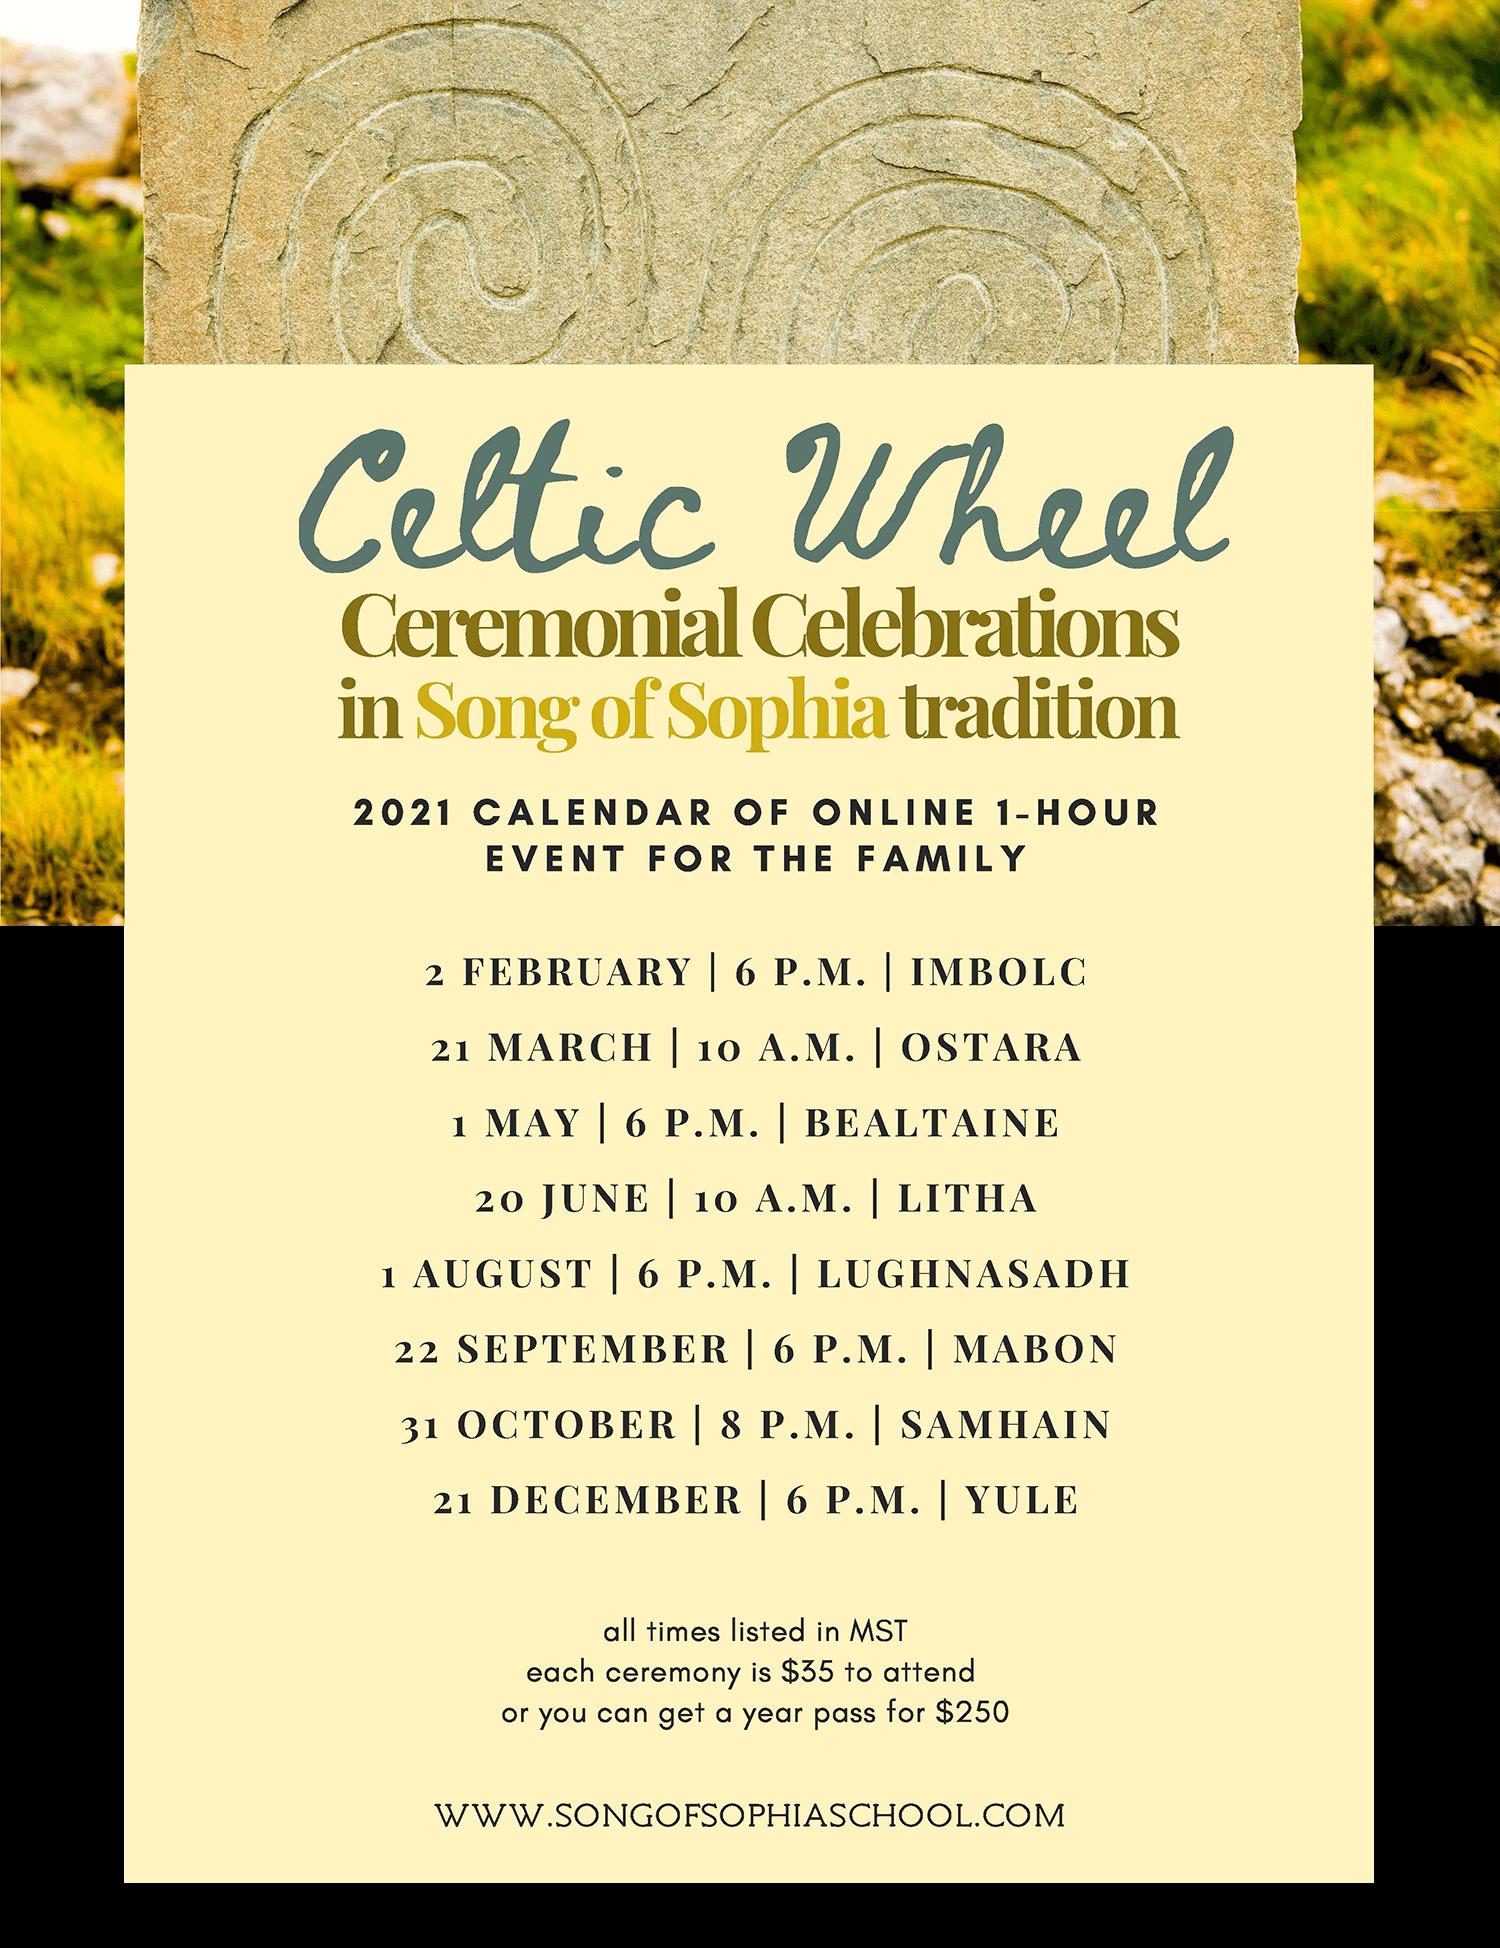 Celtic Wheel Ceremonial Celebration